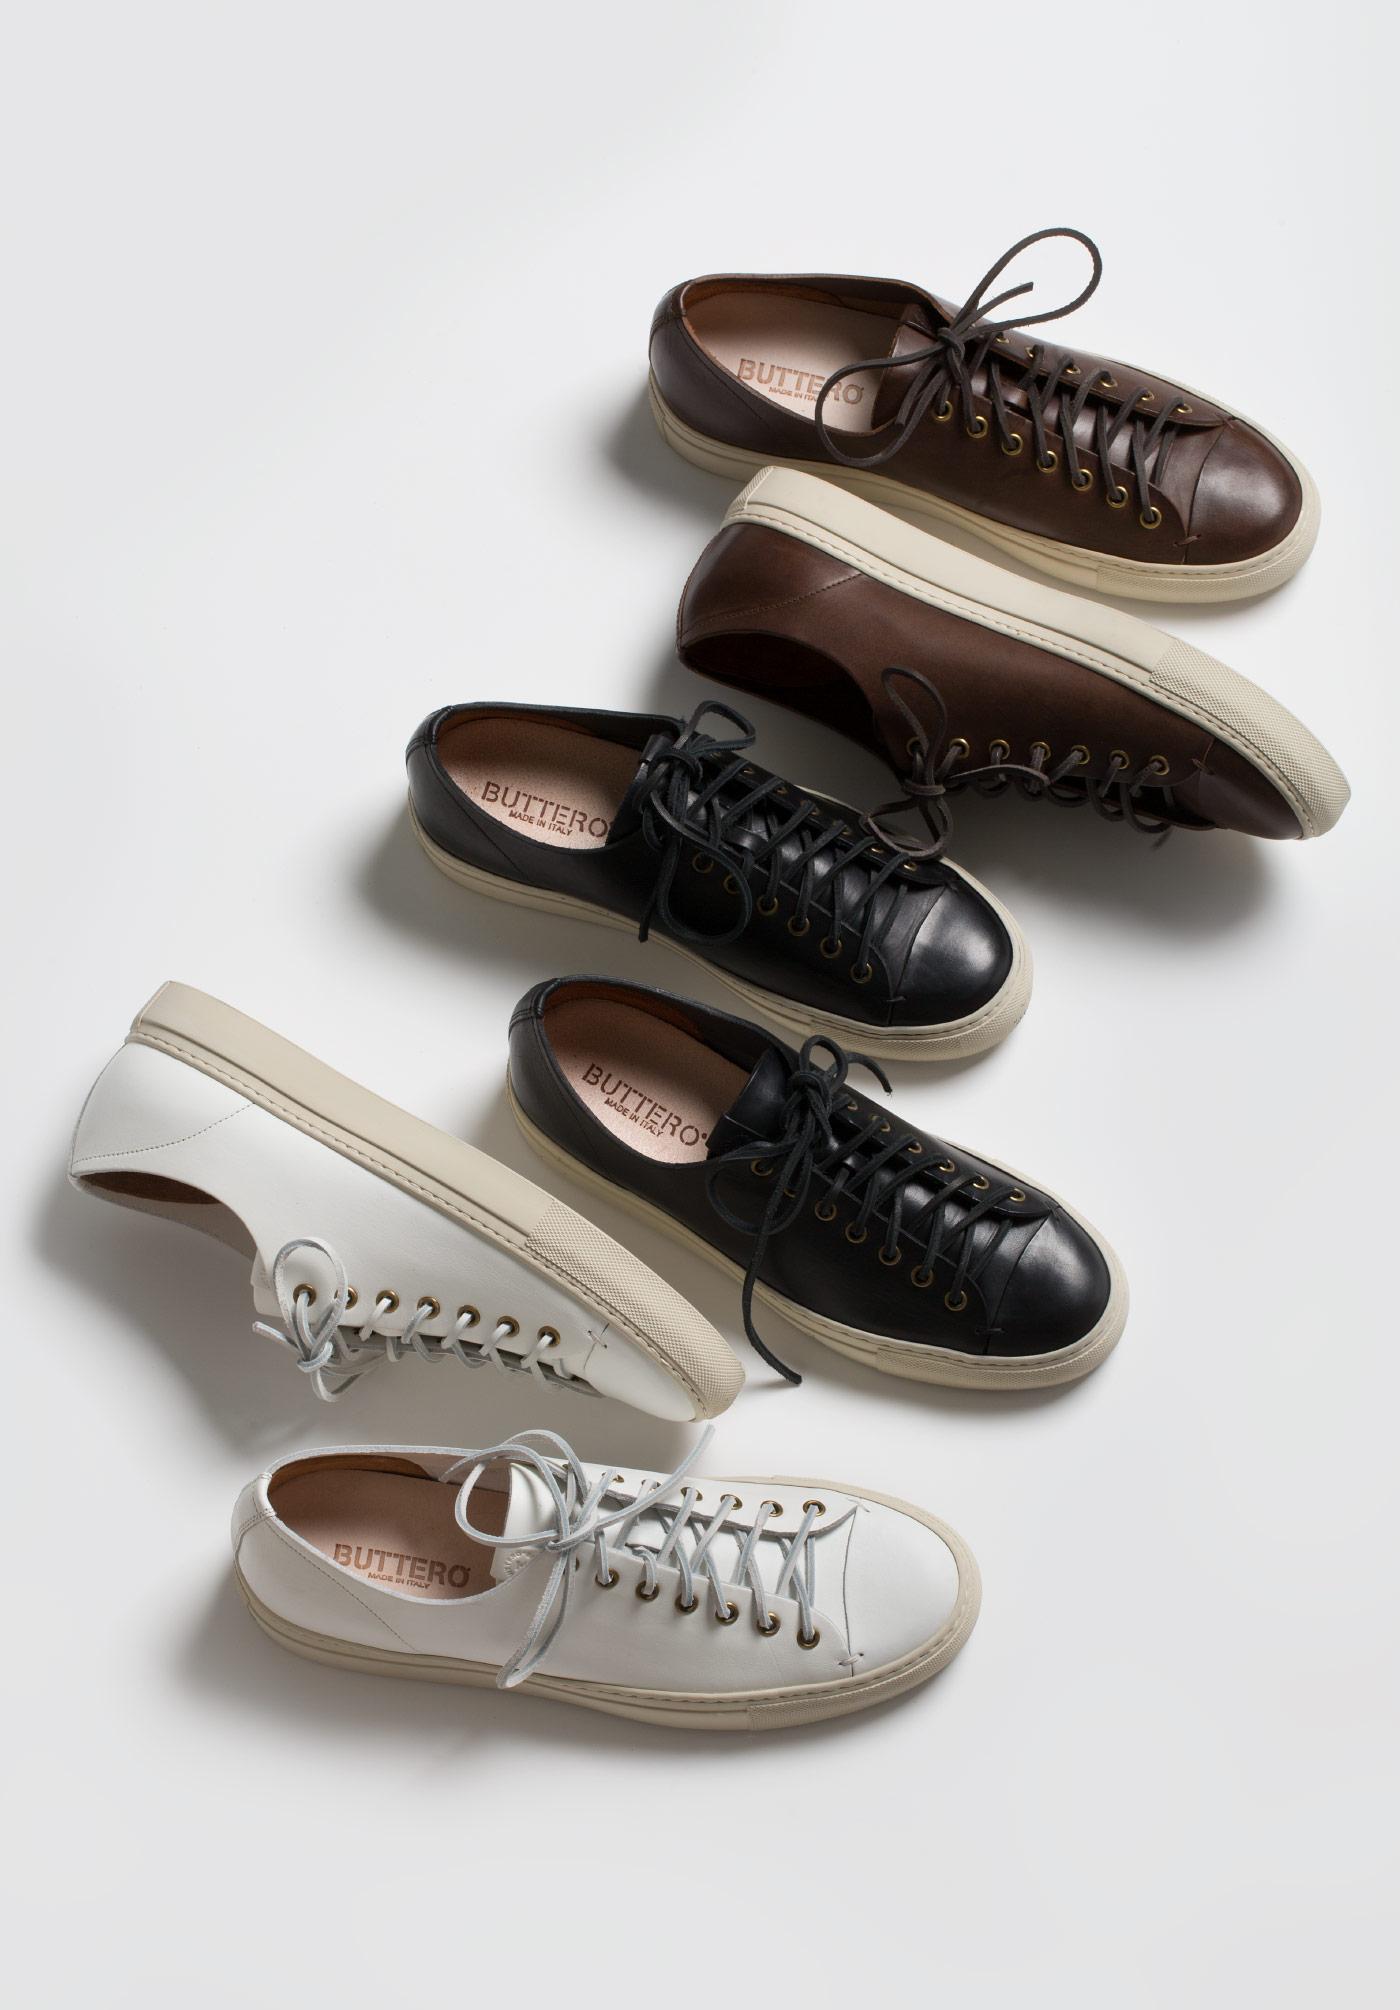 OPUMO-Buttero-Tanino-Low-Sneakers